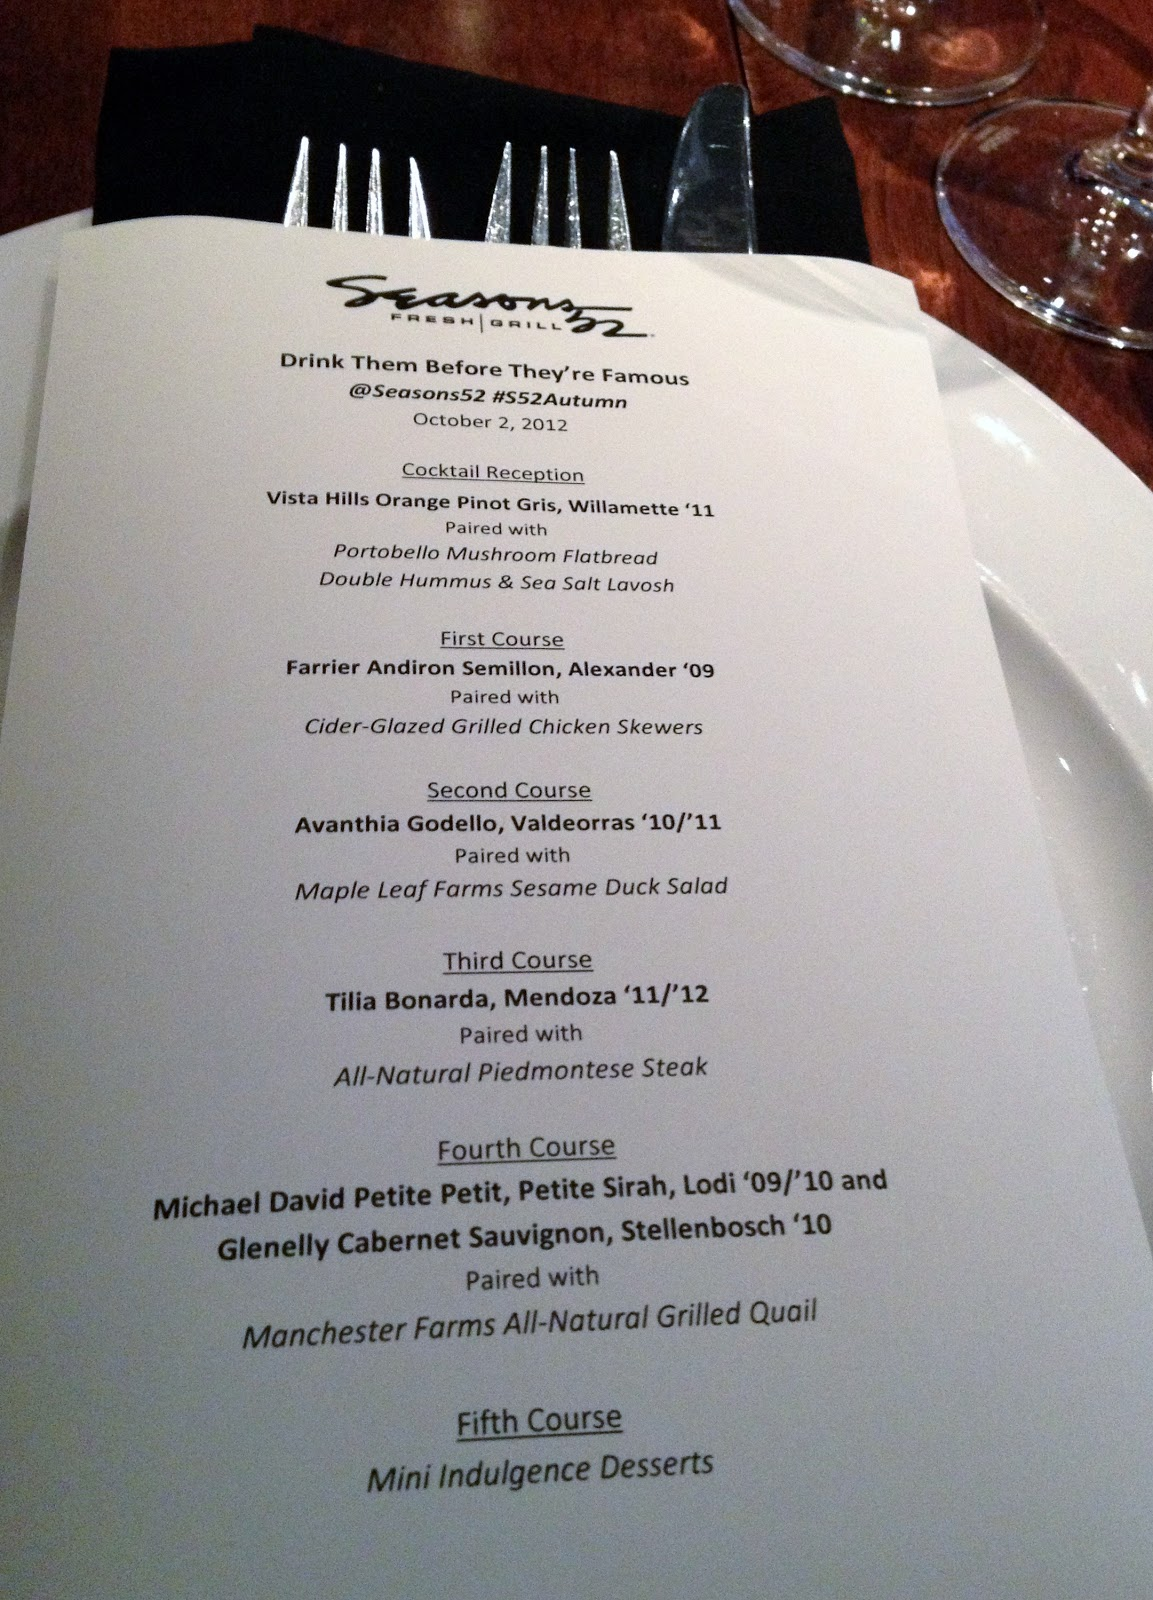 an autumn menu tasting at seasons 52